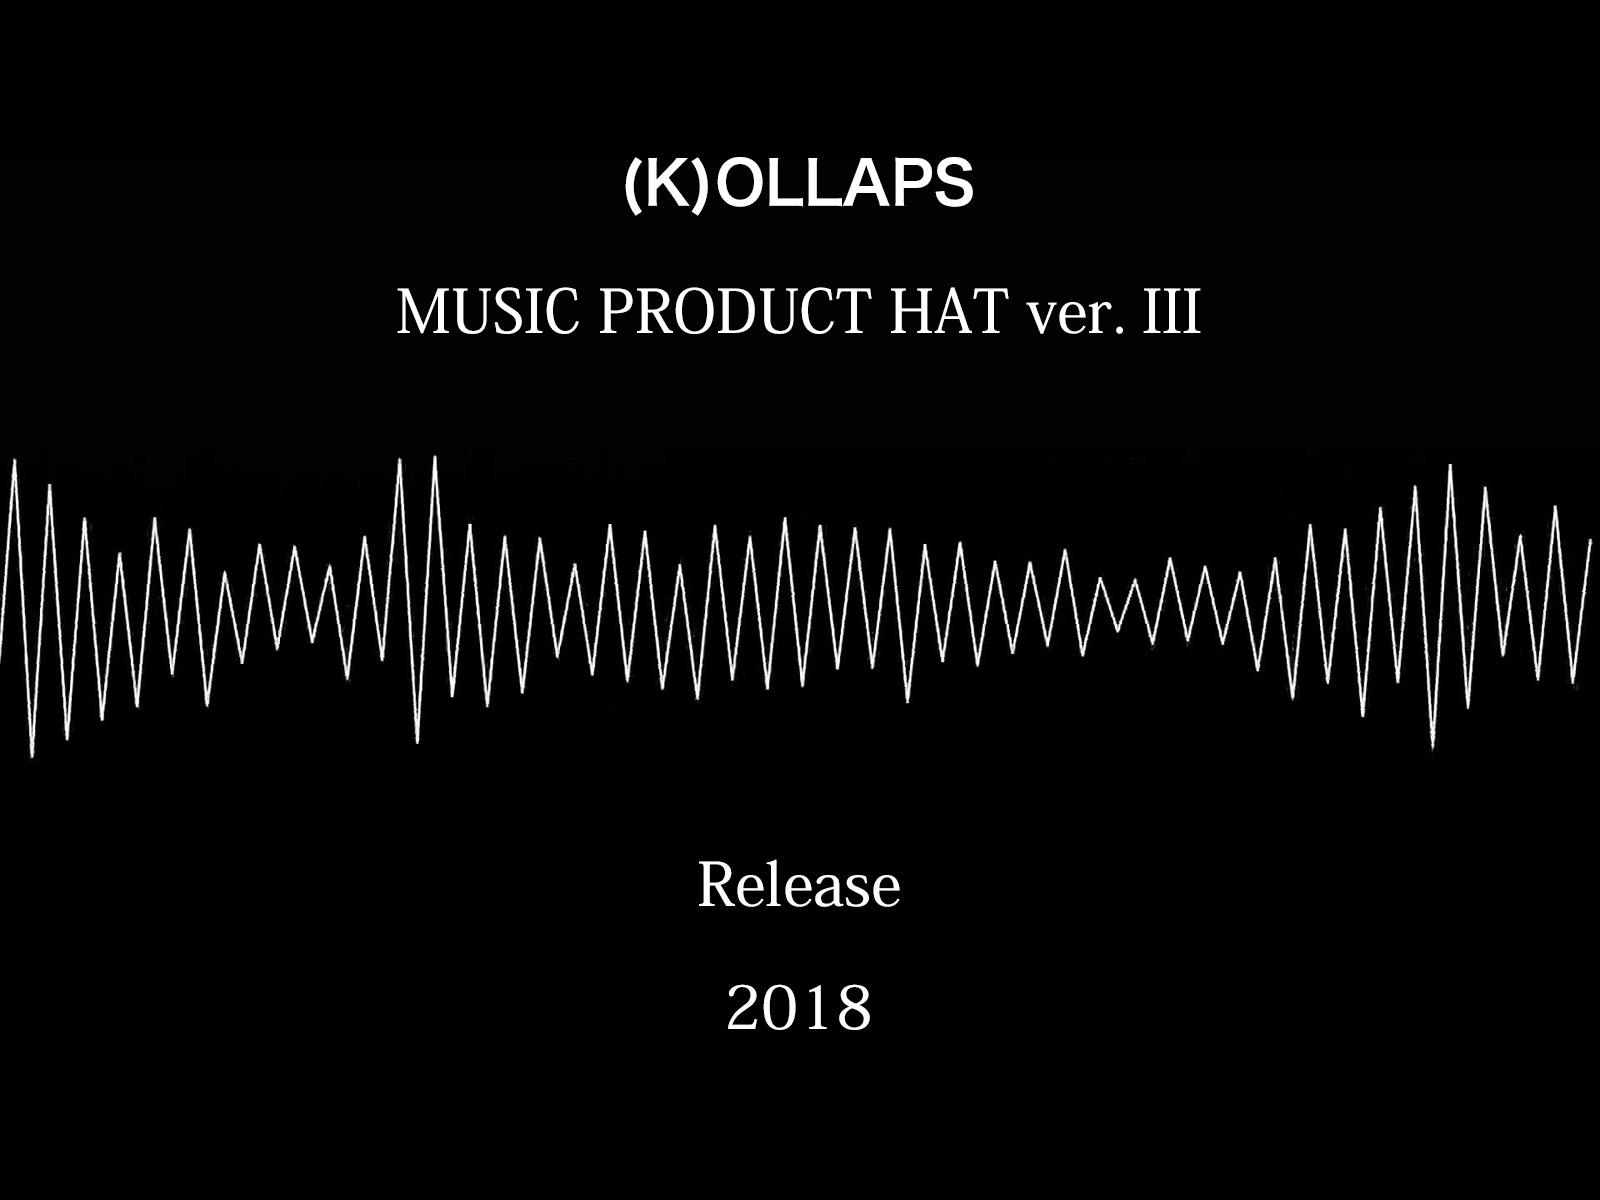 (K)OLLAPS ミュージック・プロダクトハット 第三弾リリース決定!